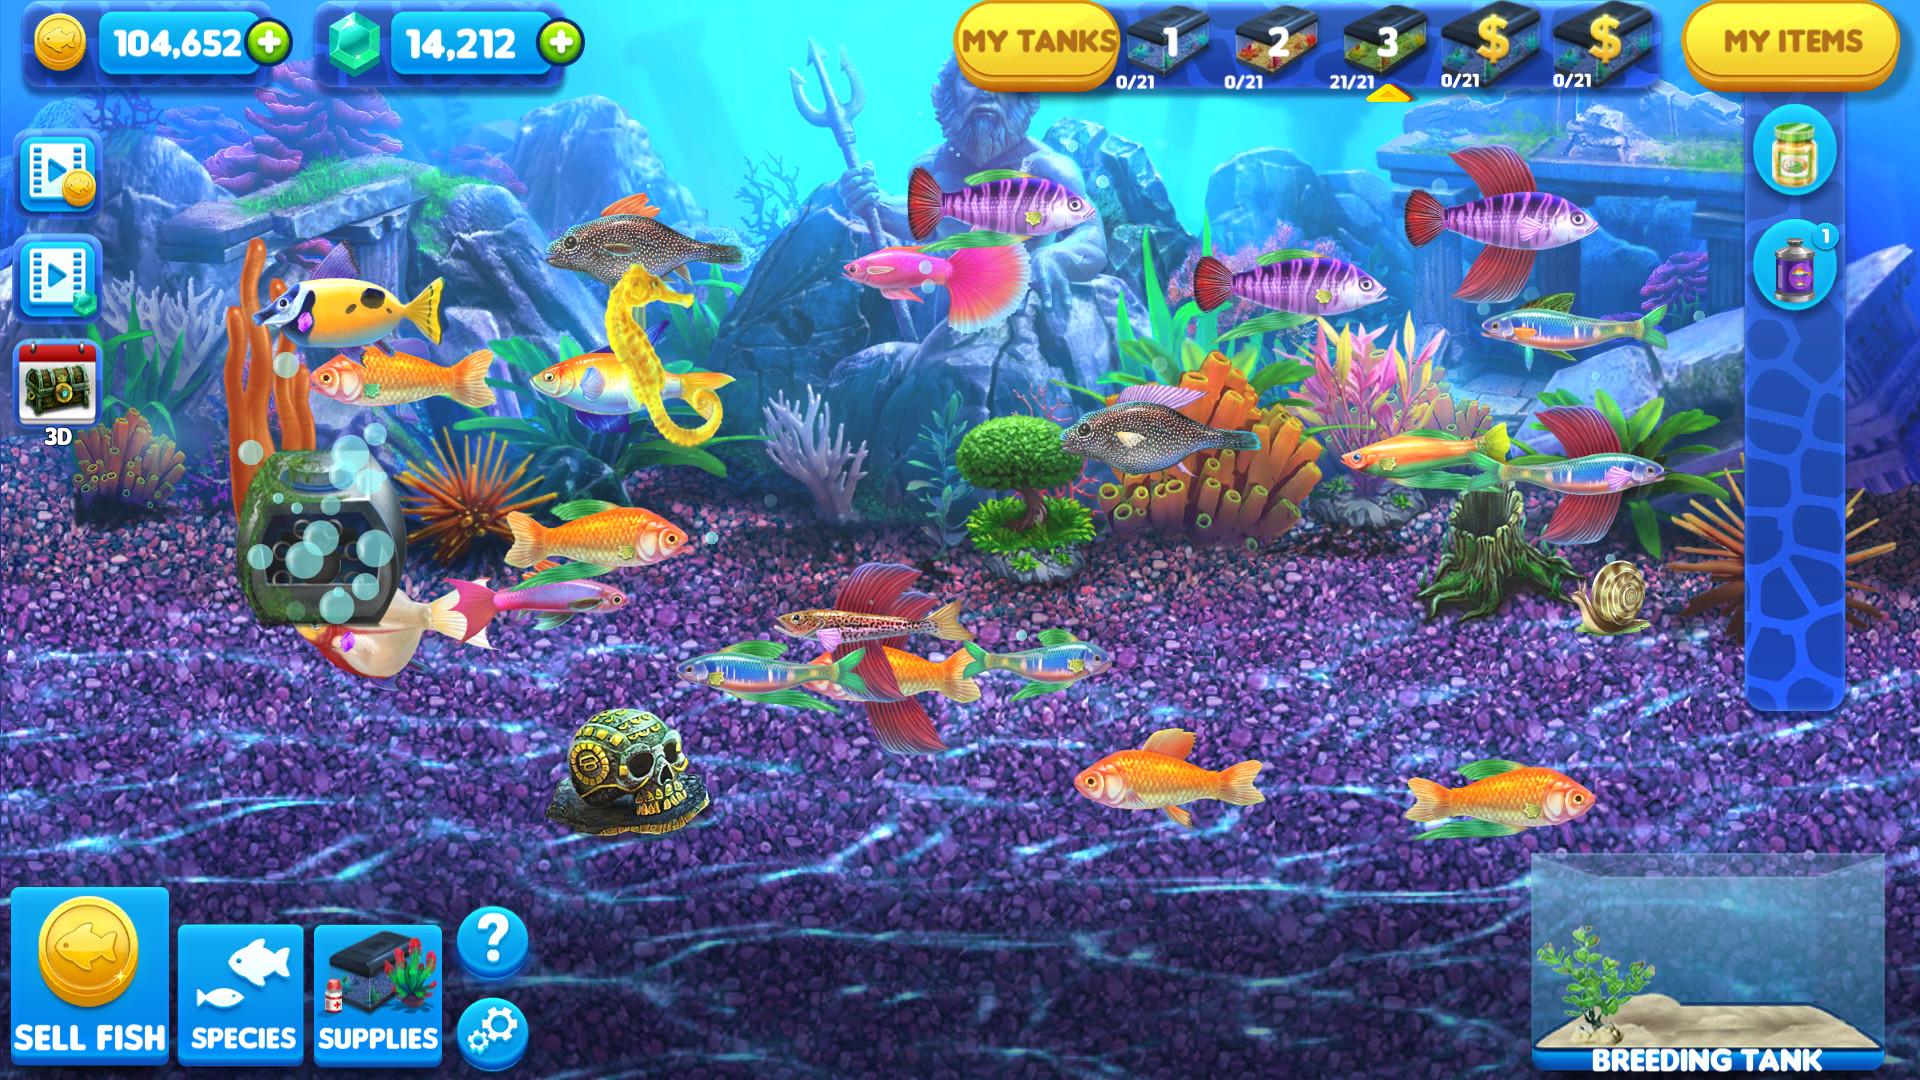 dating online sites free fish tank games videos game